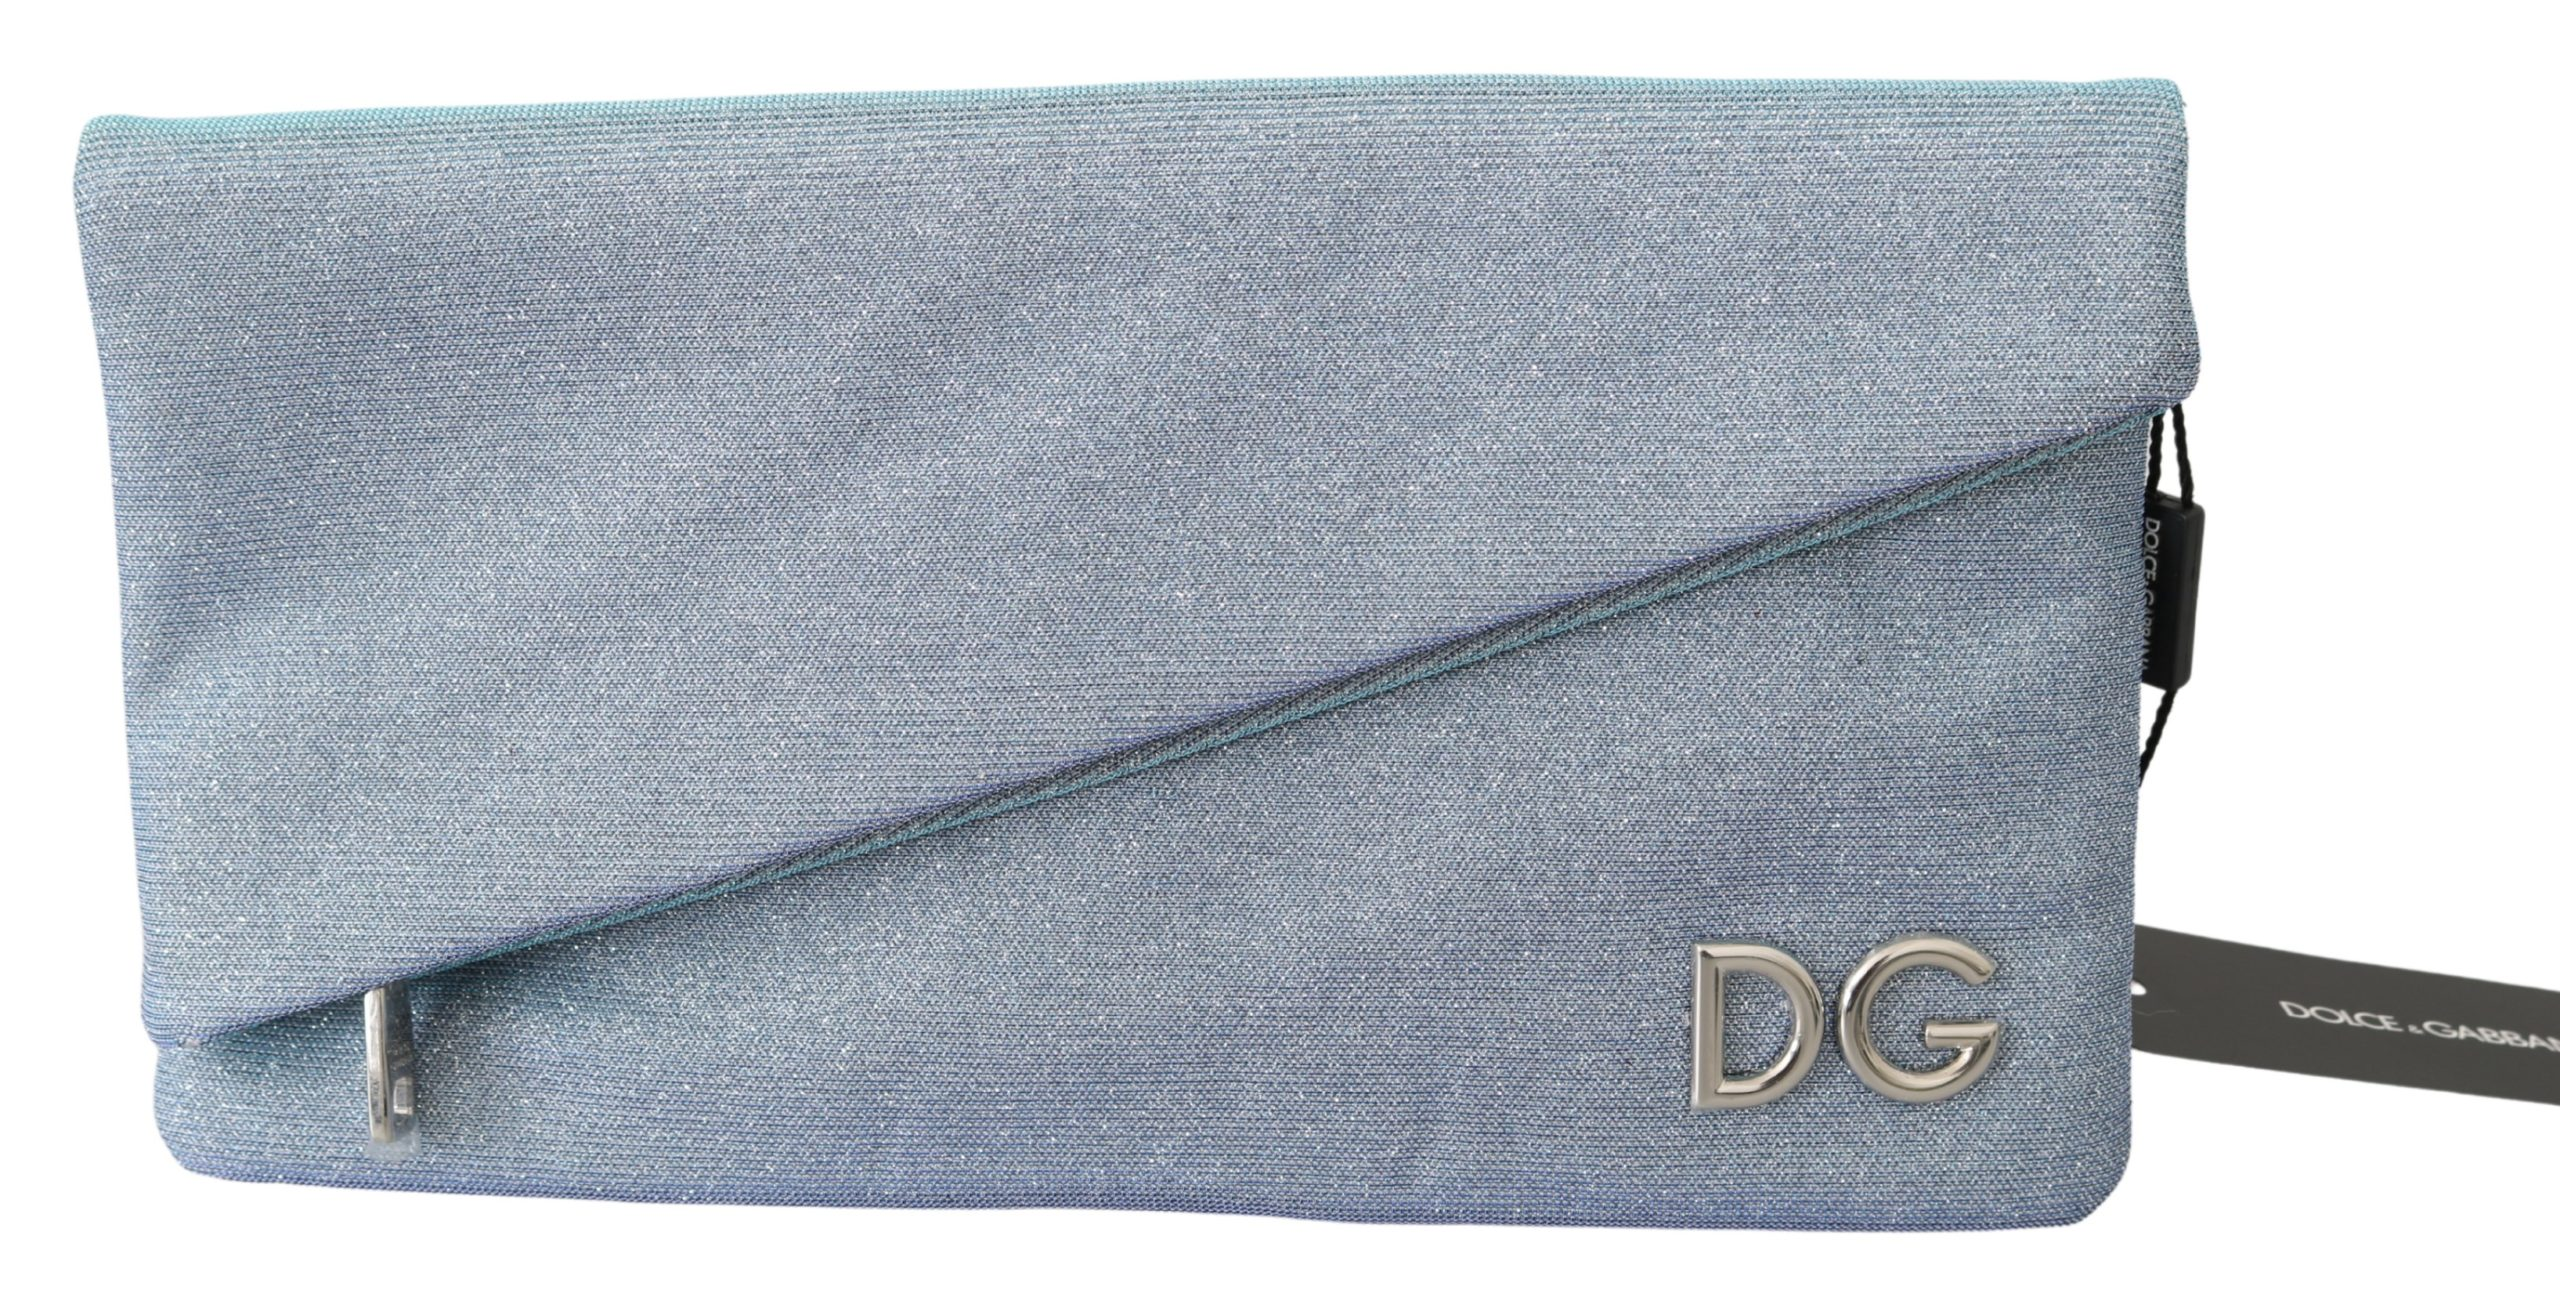 Dolce & Gabbana Women's DG Logo Canvas CLEO Handbag Light Blue VAS9788